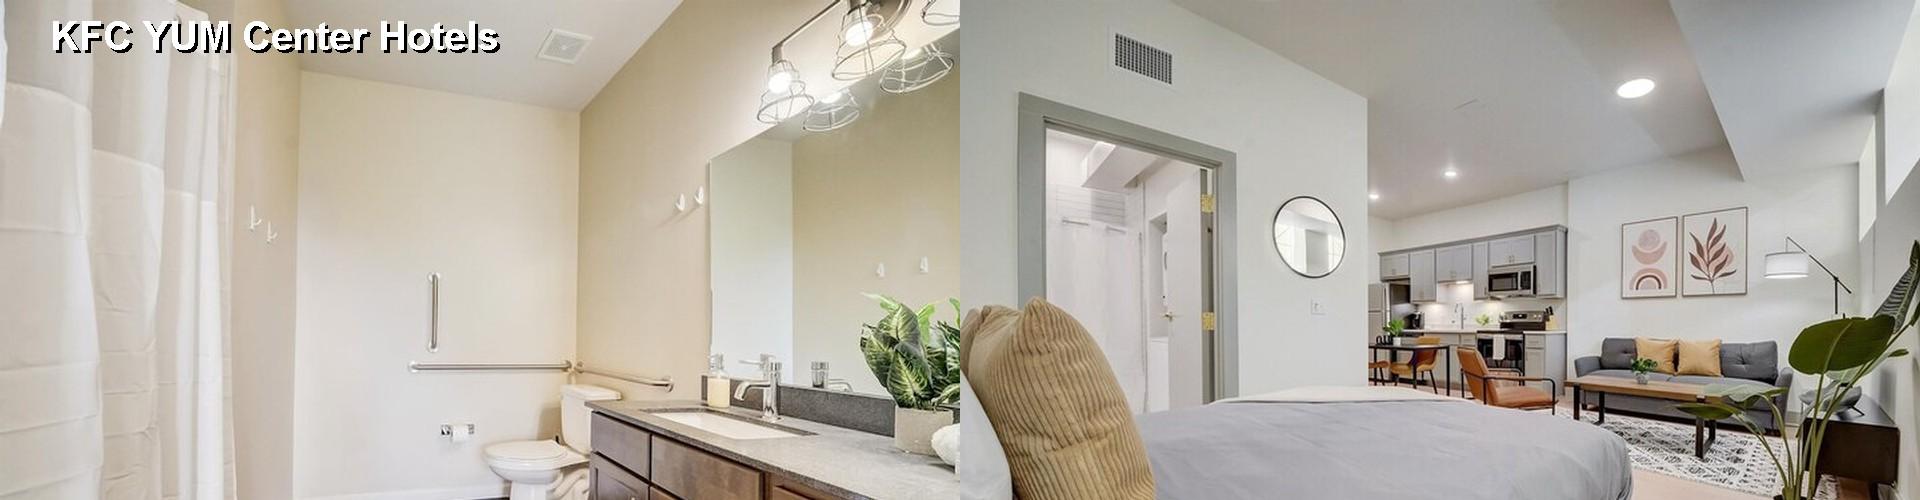 5 Best Hotels Near Kfc Yum Center